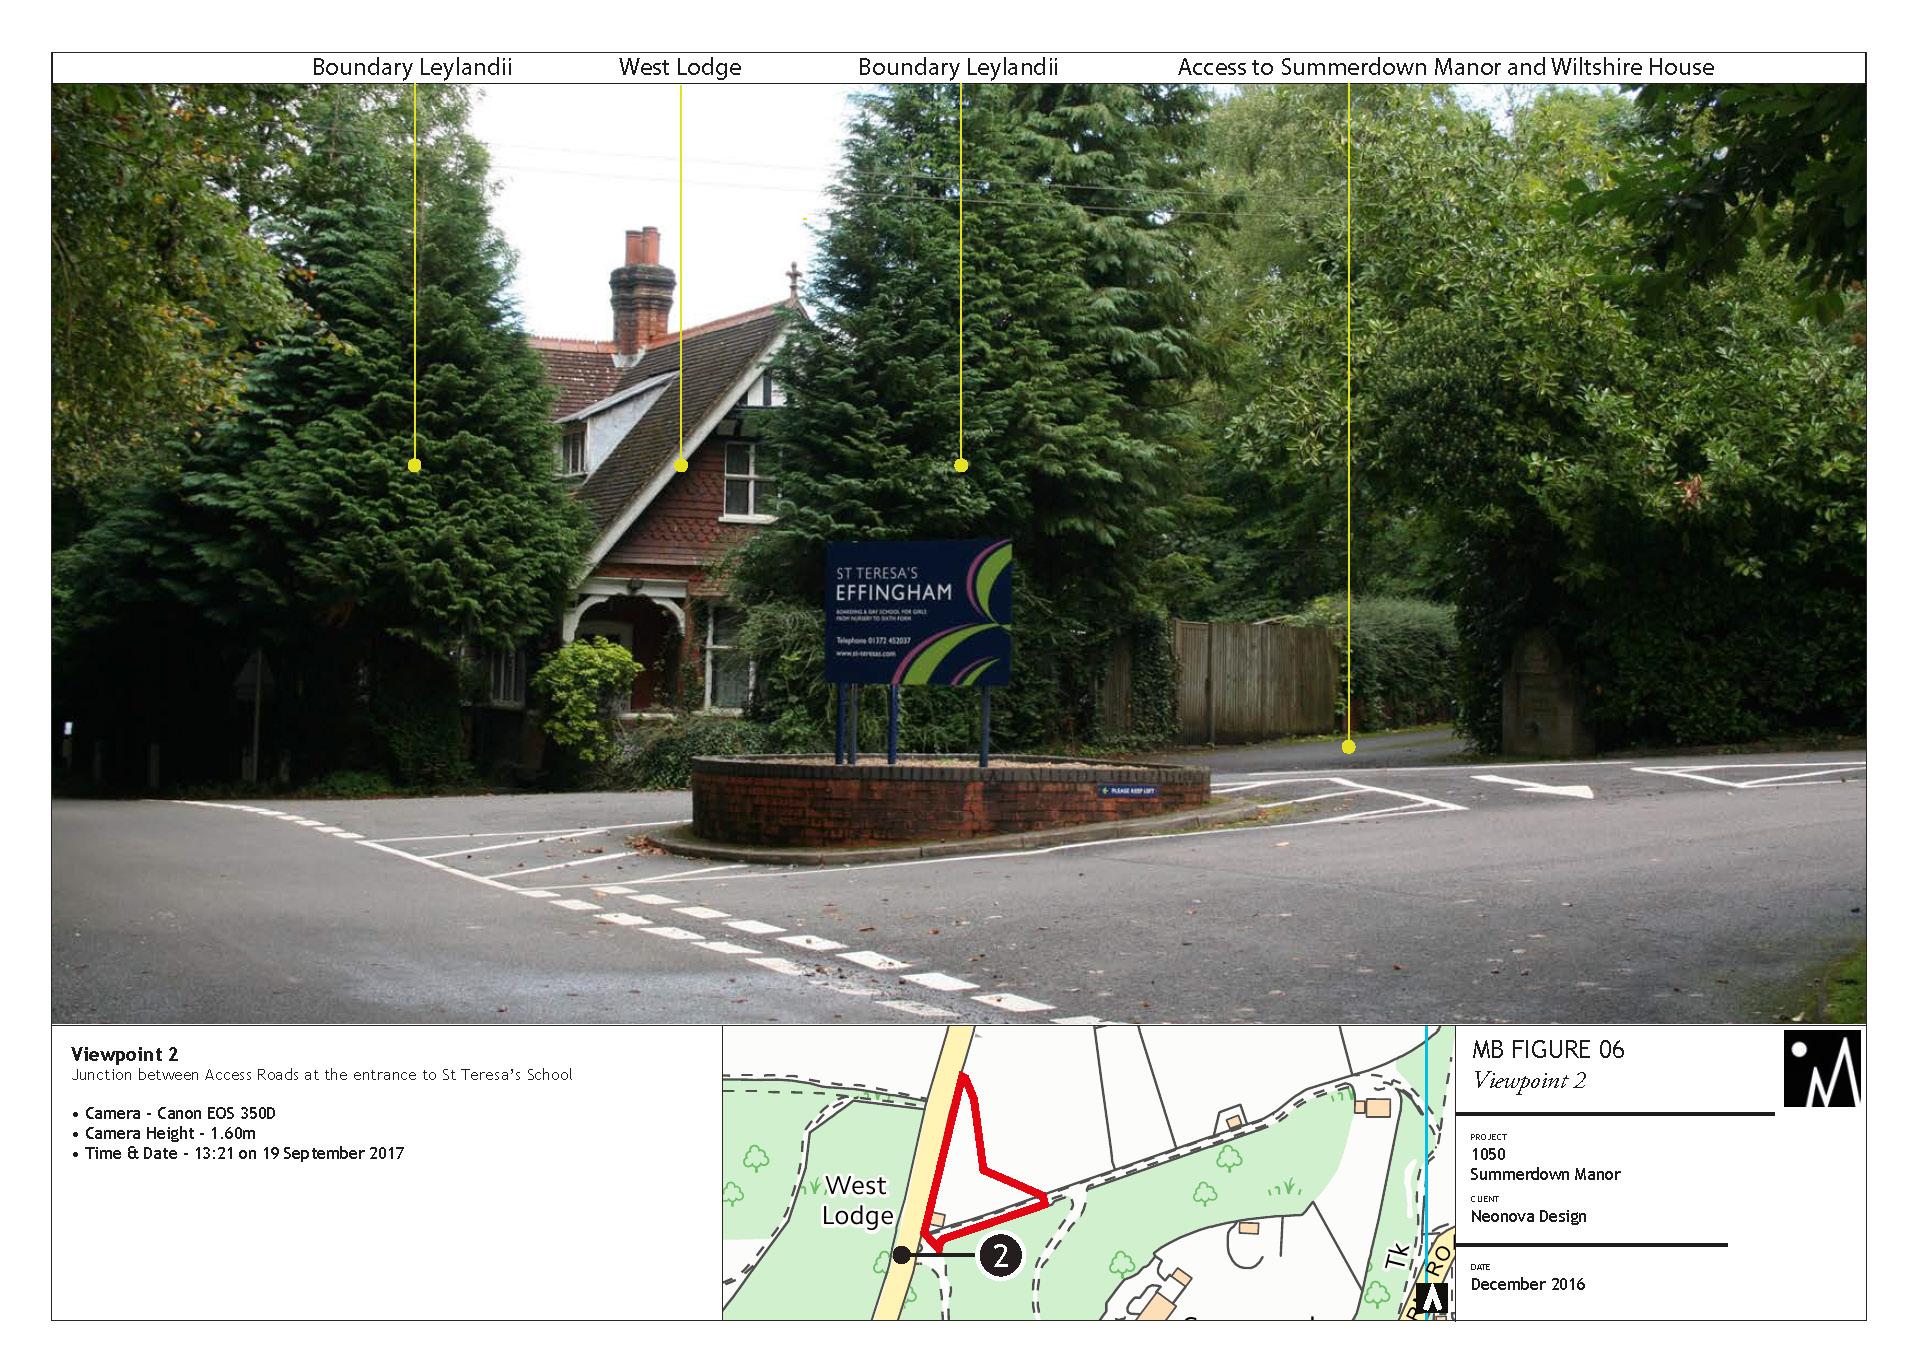 1050 Summerdown Manor Figures Final 6.jpg